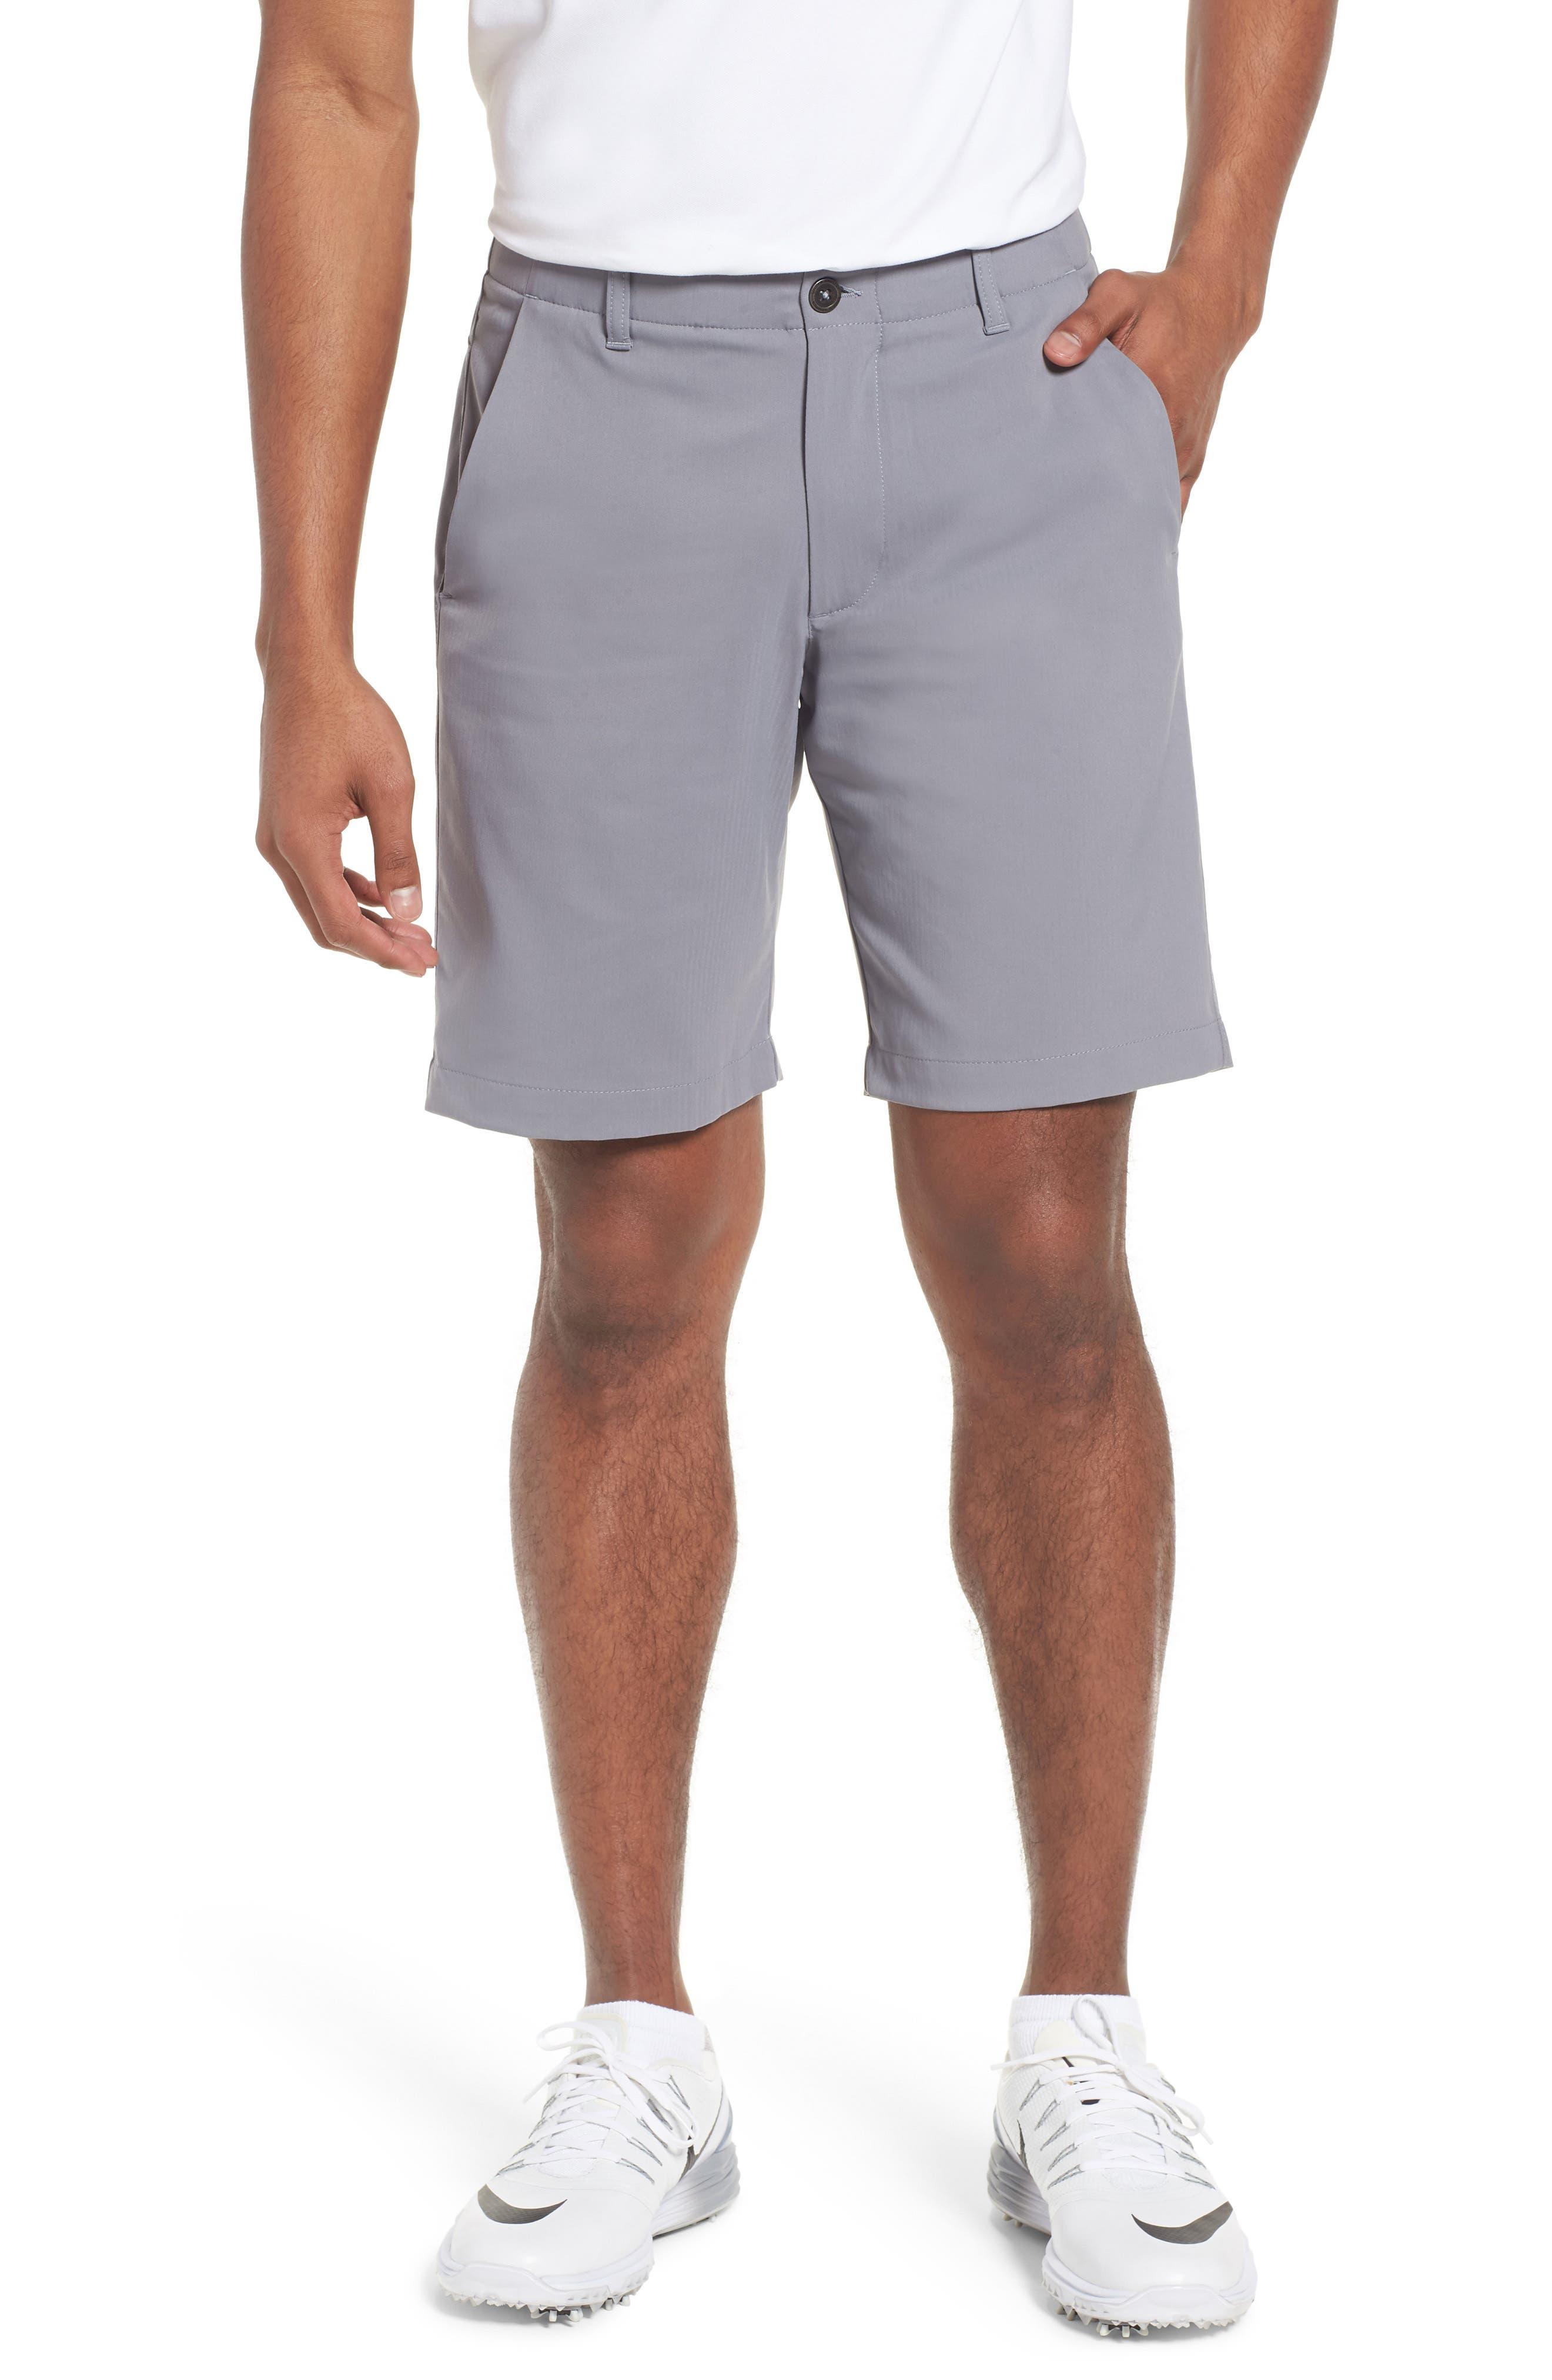 Takeover Regular Fit Golf Shorts,                         Main,                         color, Zinc Grey